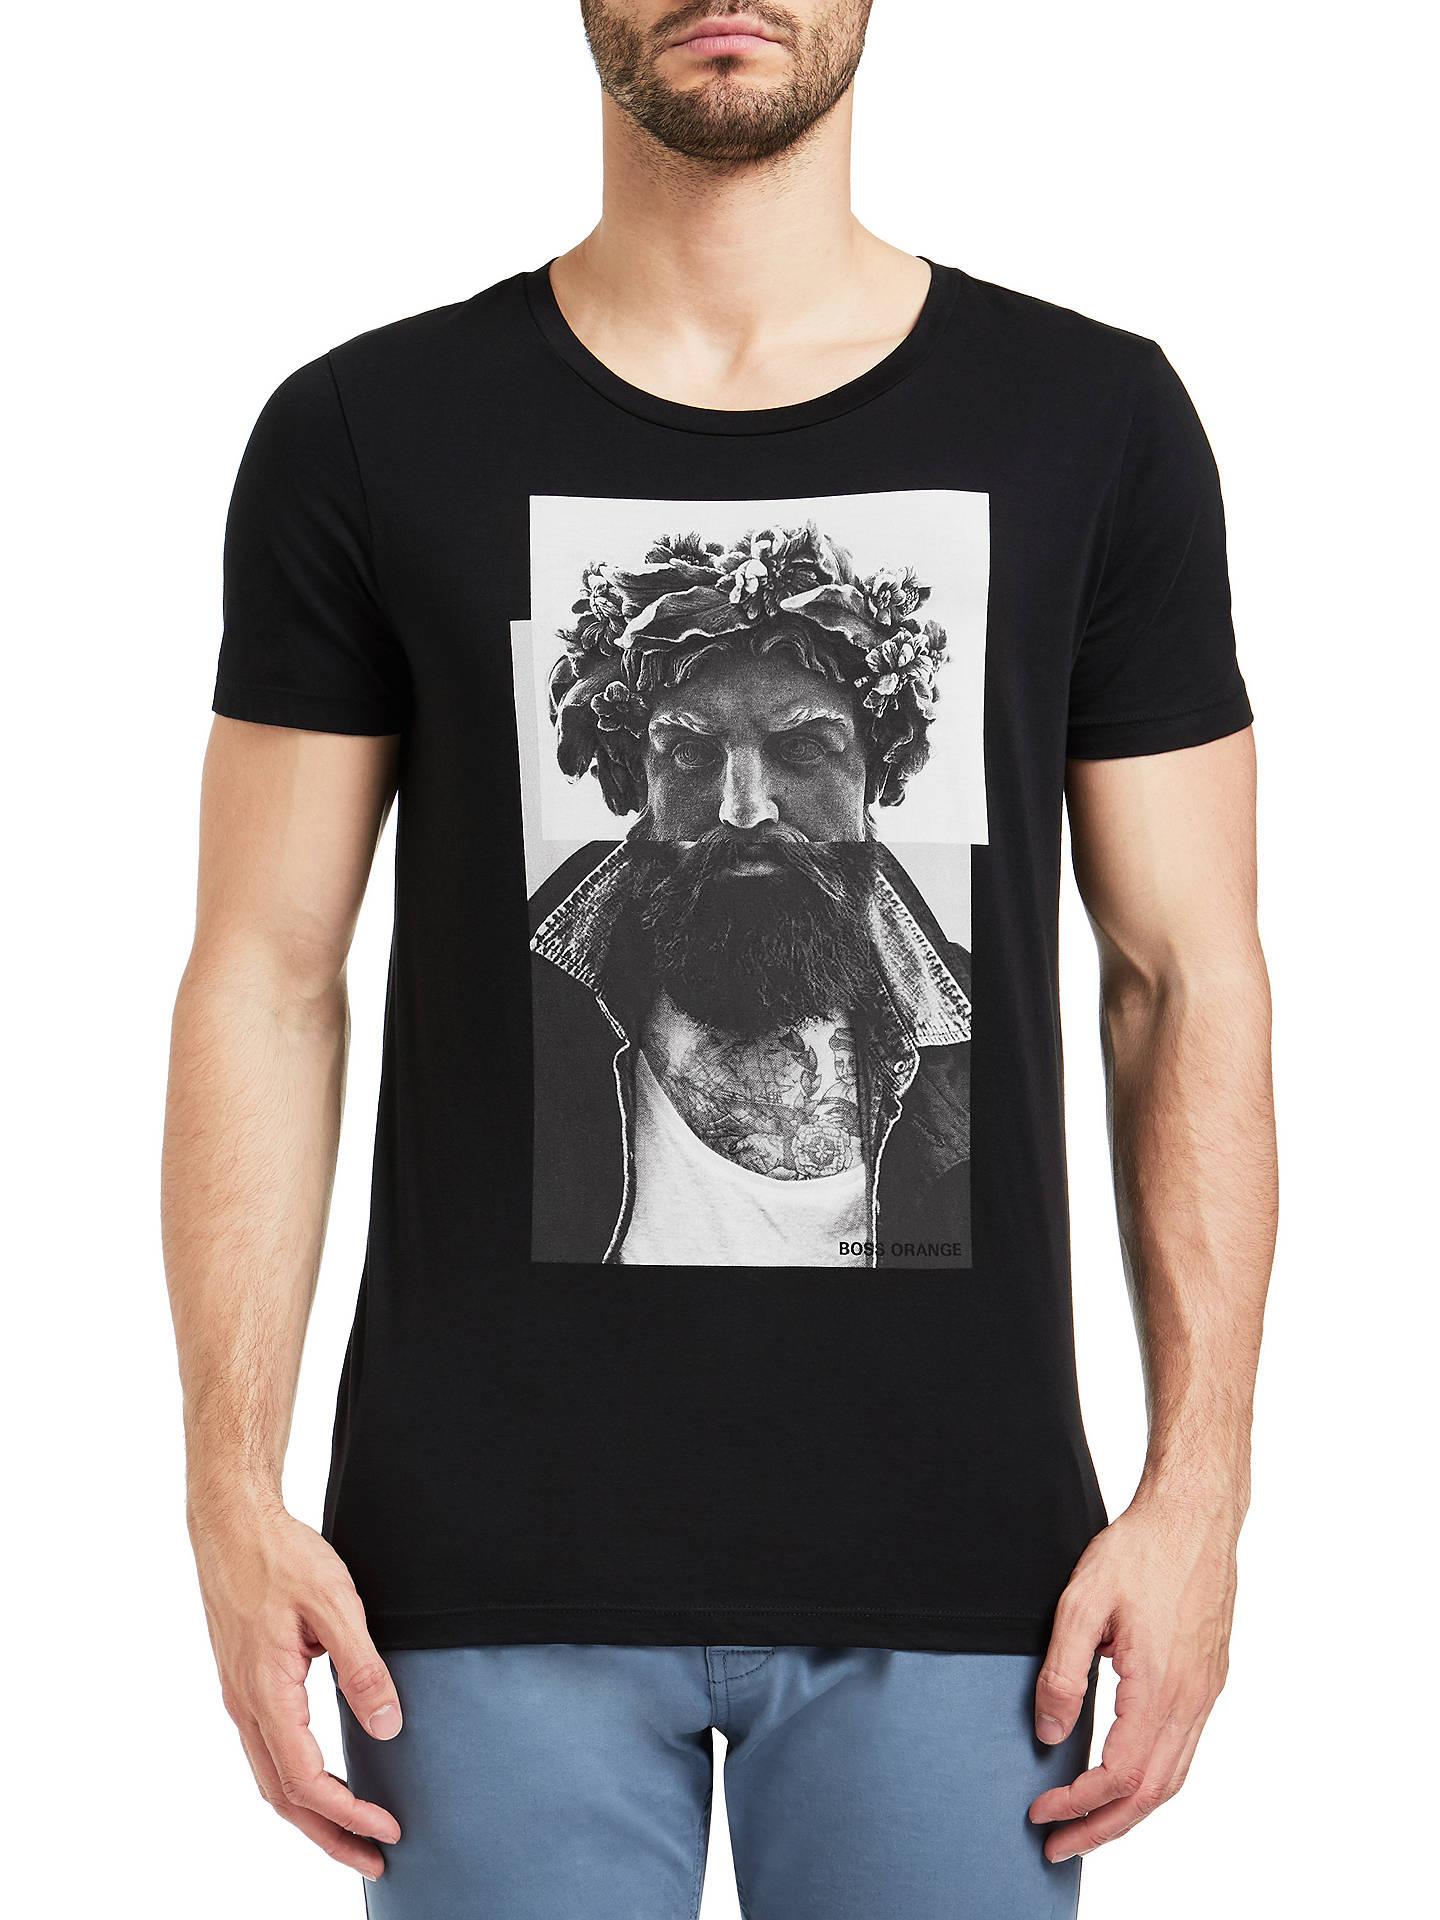 86fd8427a Buy BOSS Orange Taxable T-Shirt, Black, S Online at johnlewis.com ...